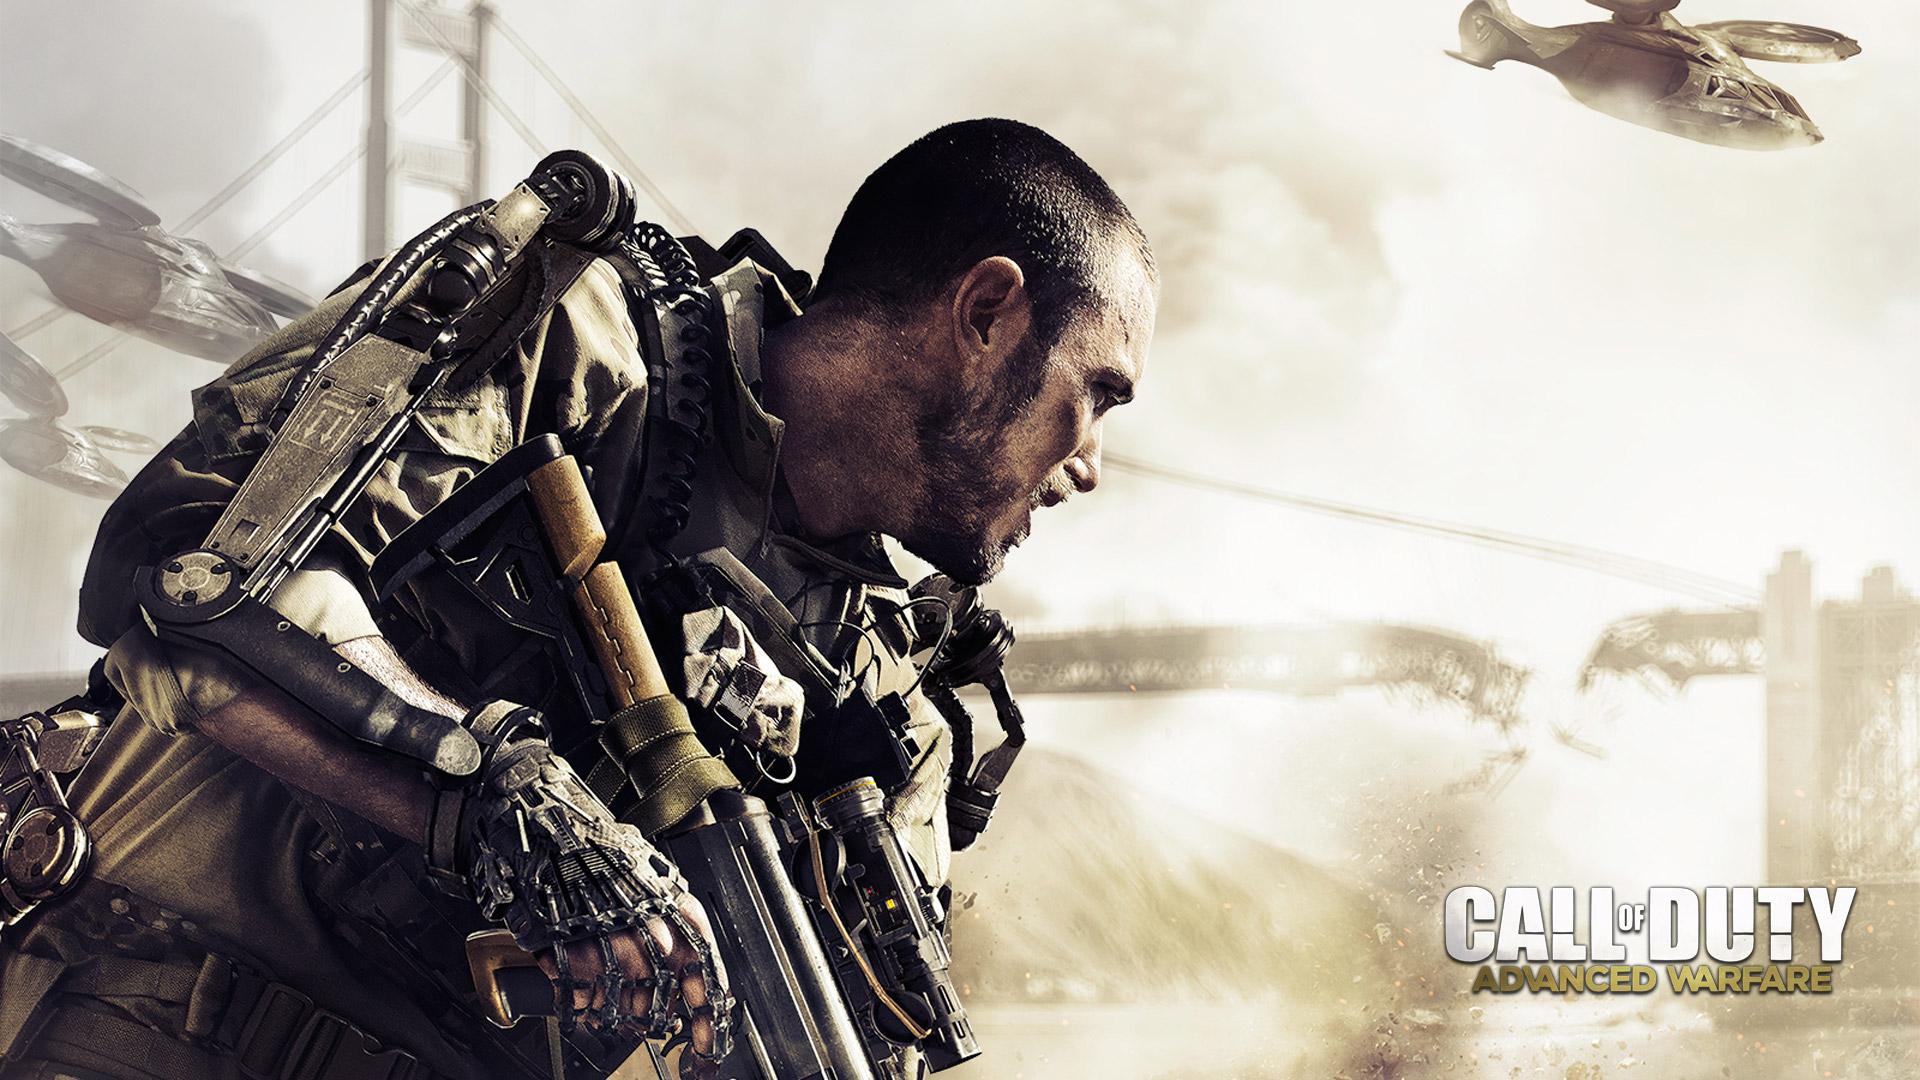 Free Call of Duty: Advanced Warfare Wallpaper in 1920x1080